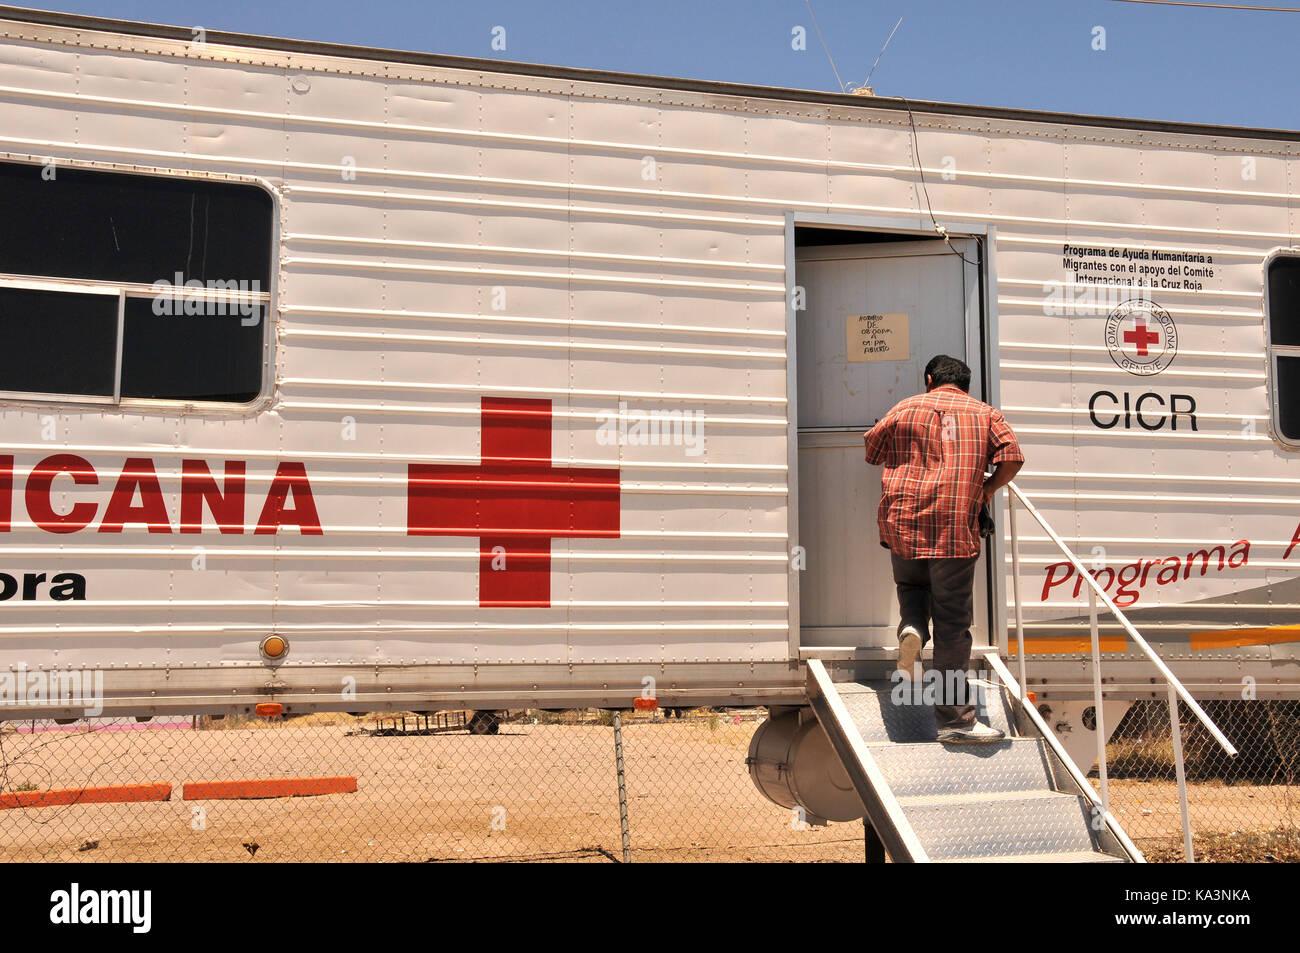 Programa de Ayuda Humanitaria a Migrantes in conjunction with the International Red Cross provides humanitarian - Stock Image